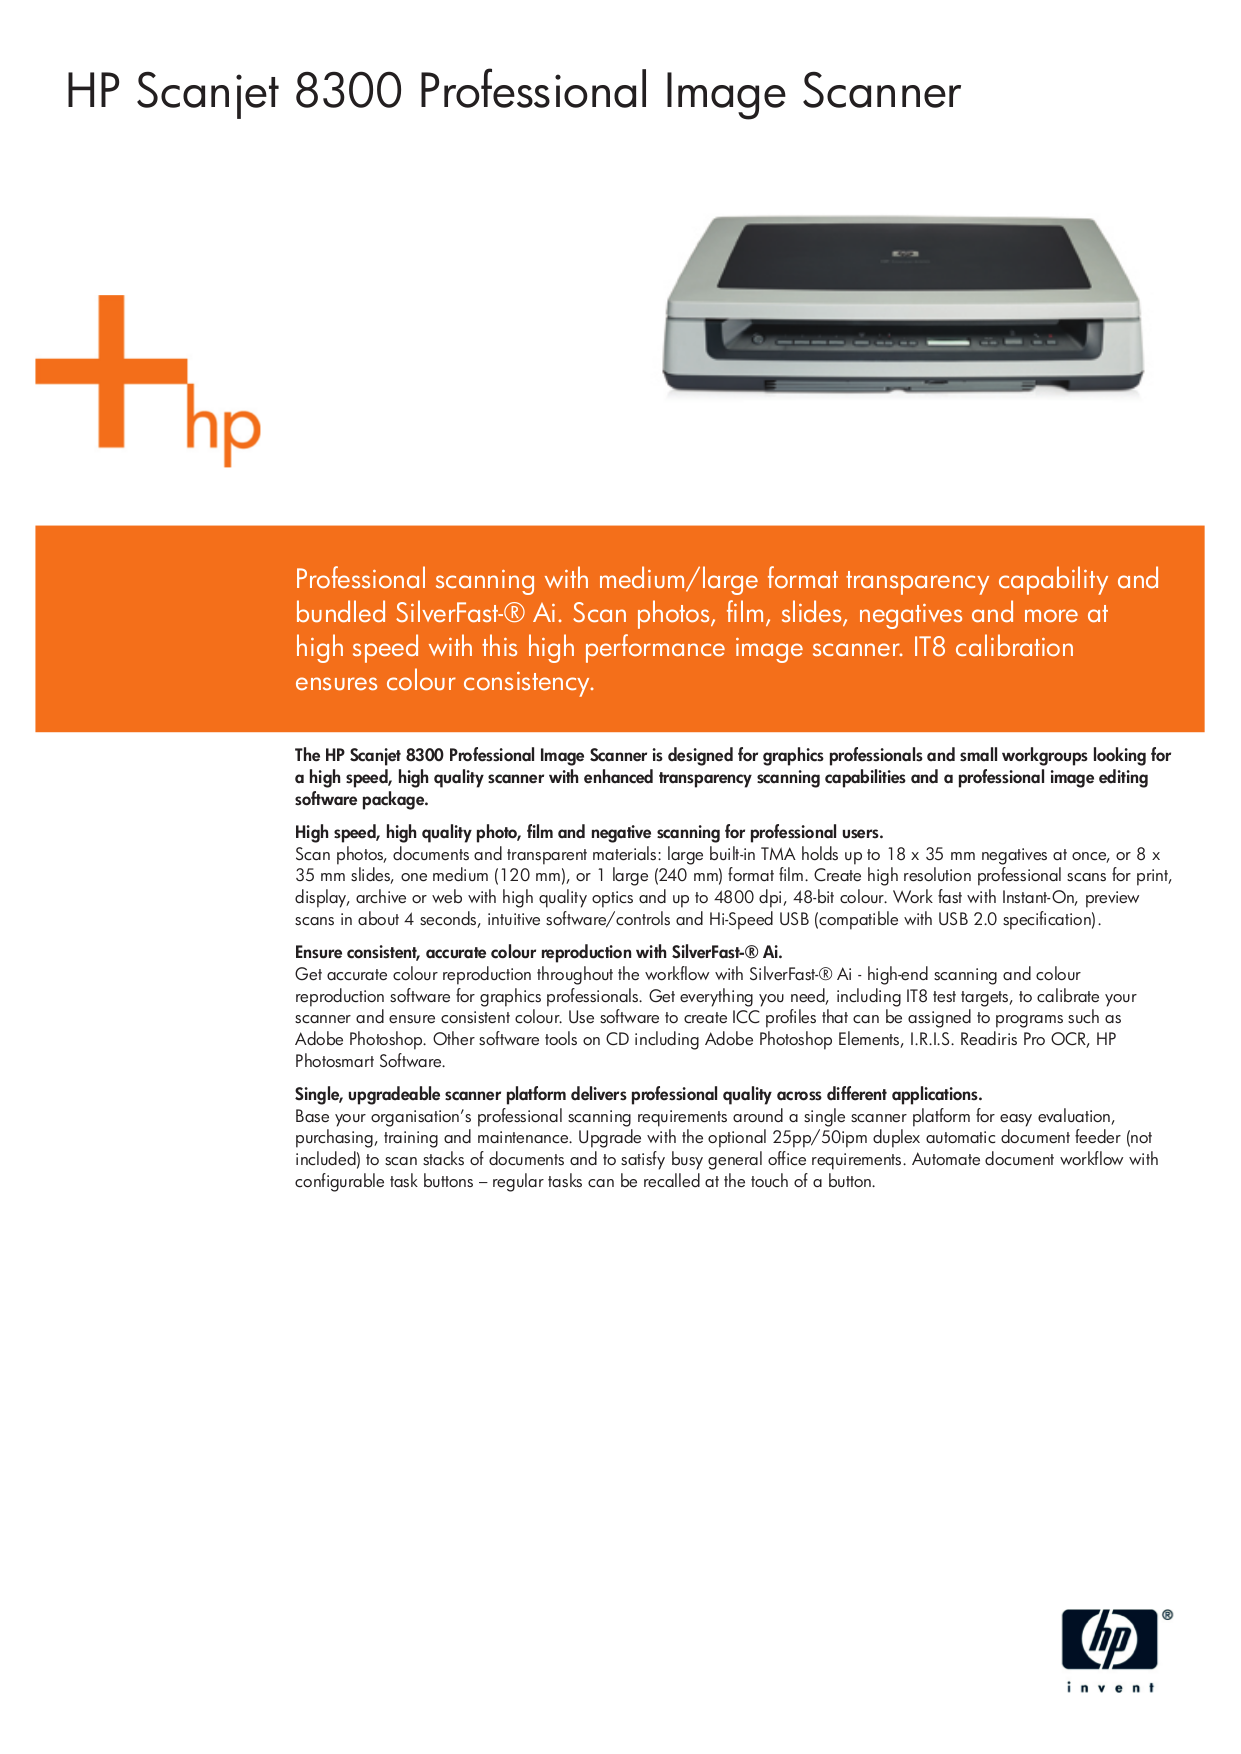 download free pdf for hp scanjet 8300 scanner manual rh umlib com HP Scanjet 8300 Windows 7 HP Scanjet 8300 Windows 7